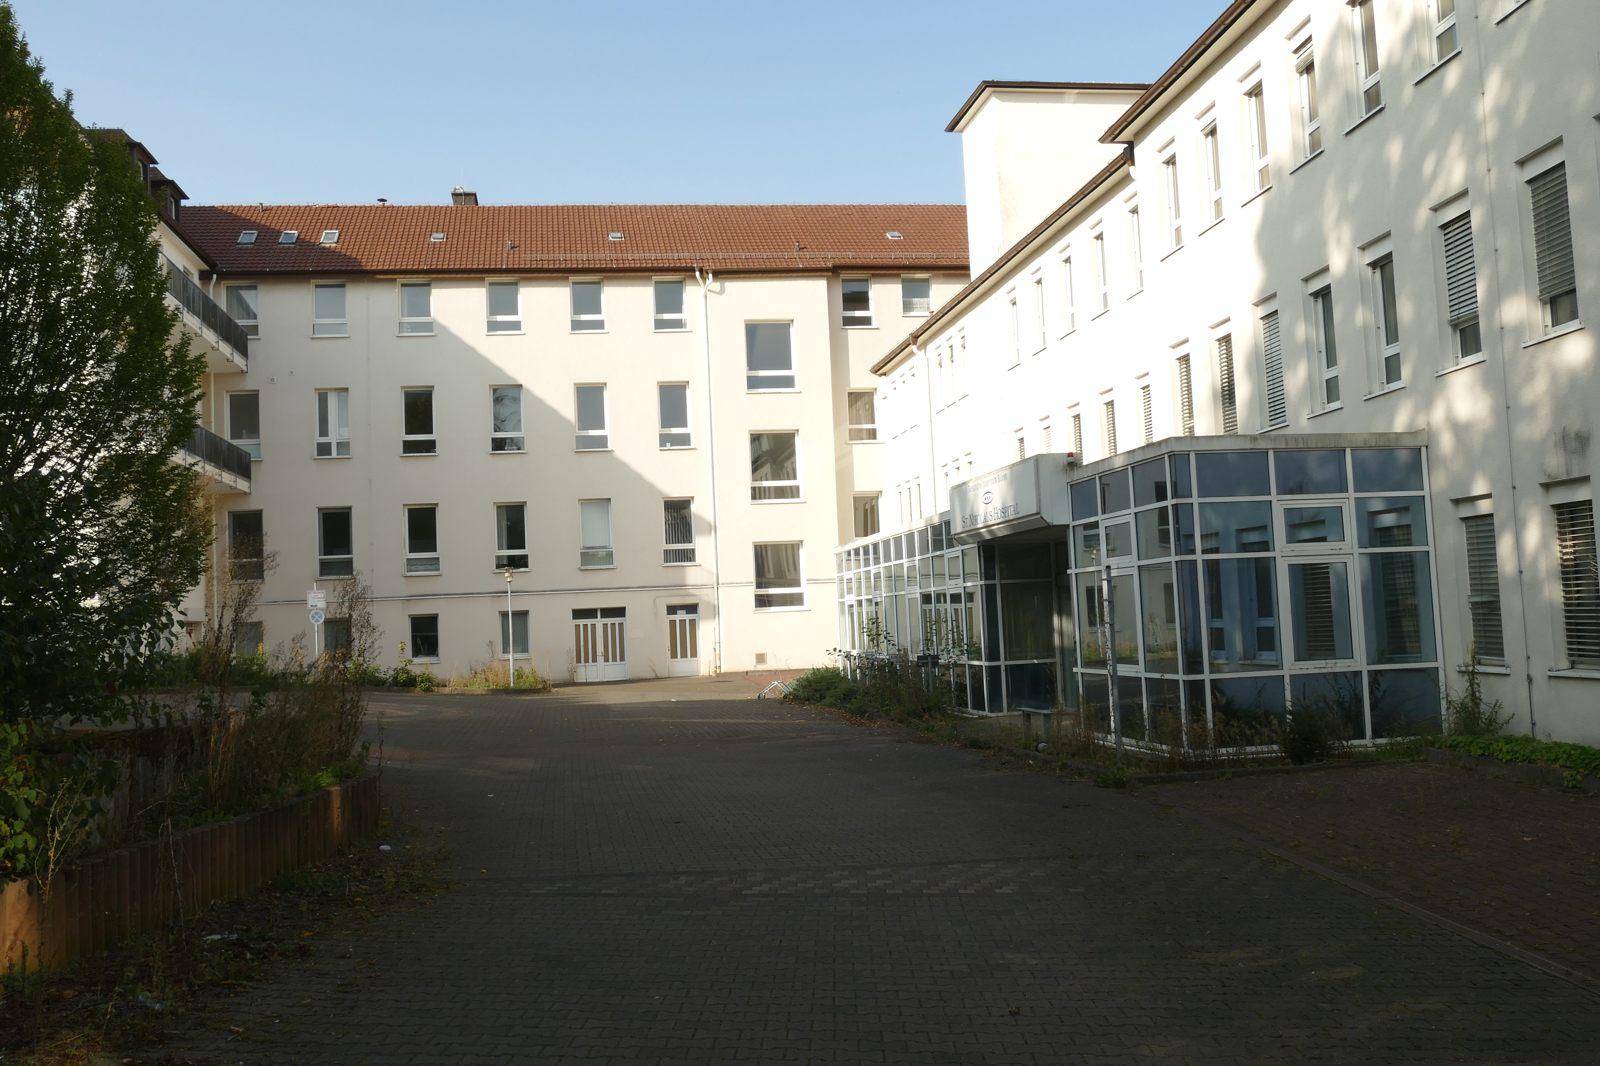 St. Nikolaus Hospital B: Papa letztlich im Jahr 2000